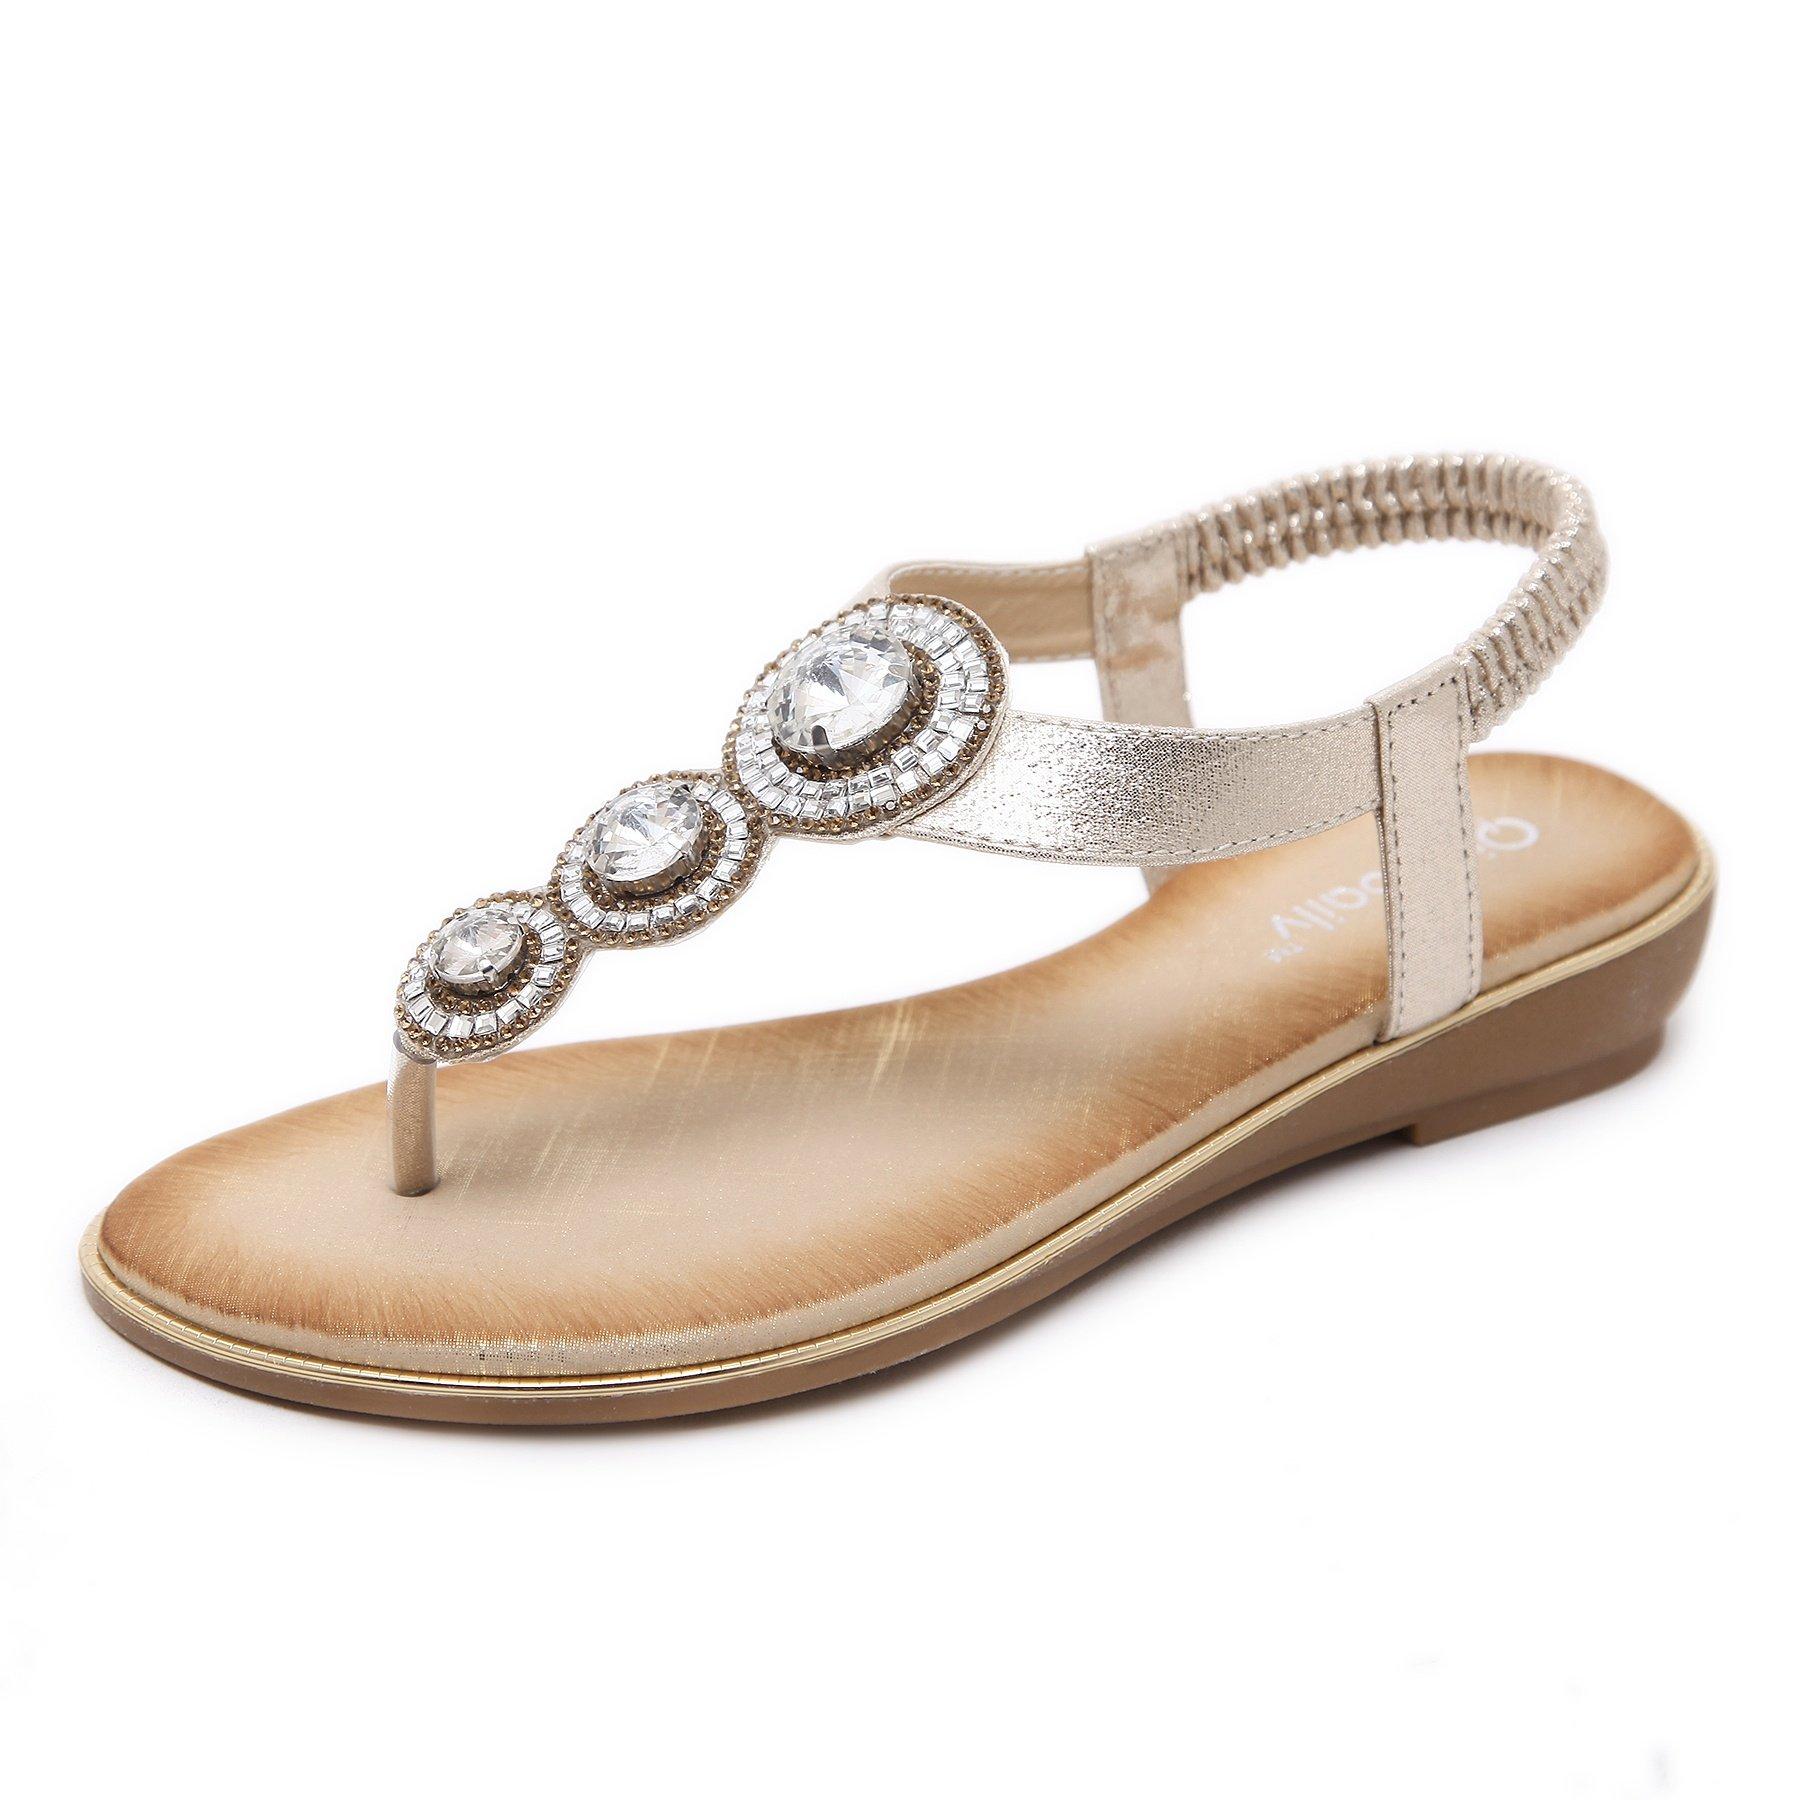 Meeshine Womens Flat Sandals Summer Rhinestone Comfort Bohemian Flip Flop Shoes Gold-02 US 8.5 by Meeshine (Image #1)